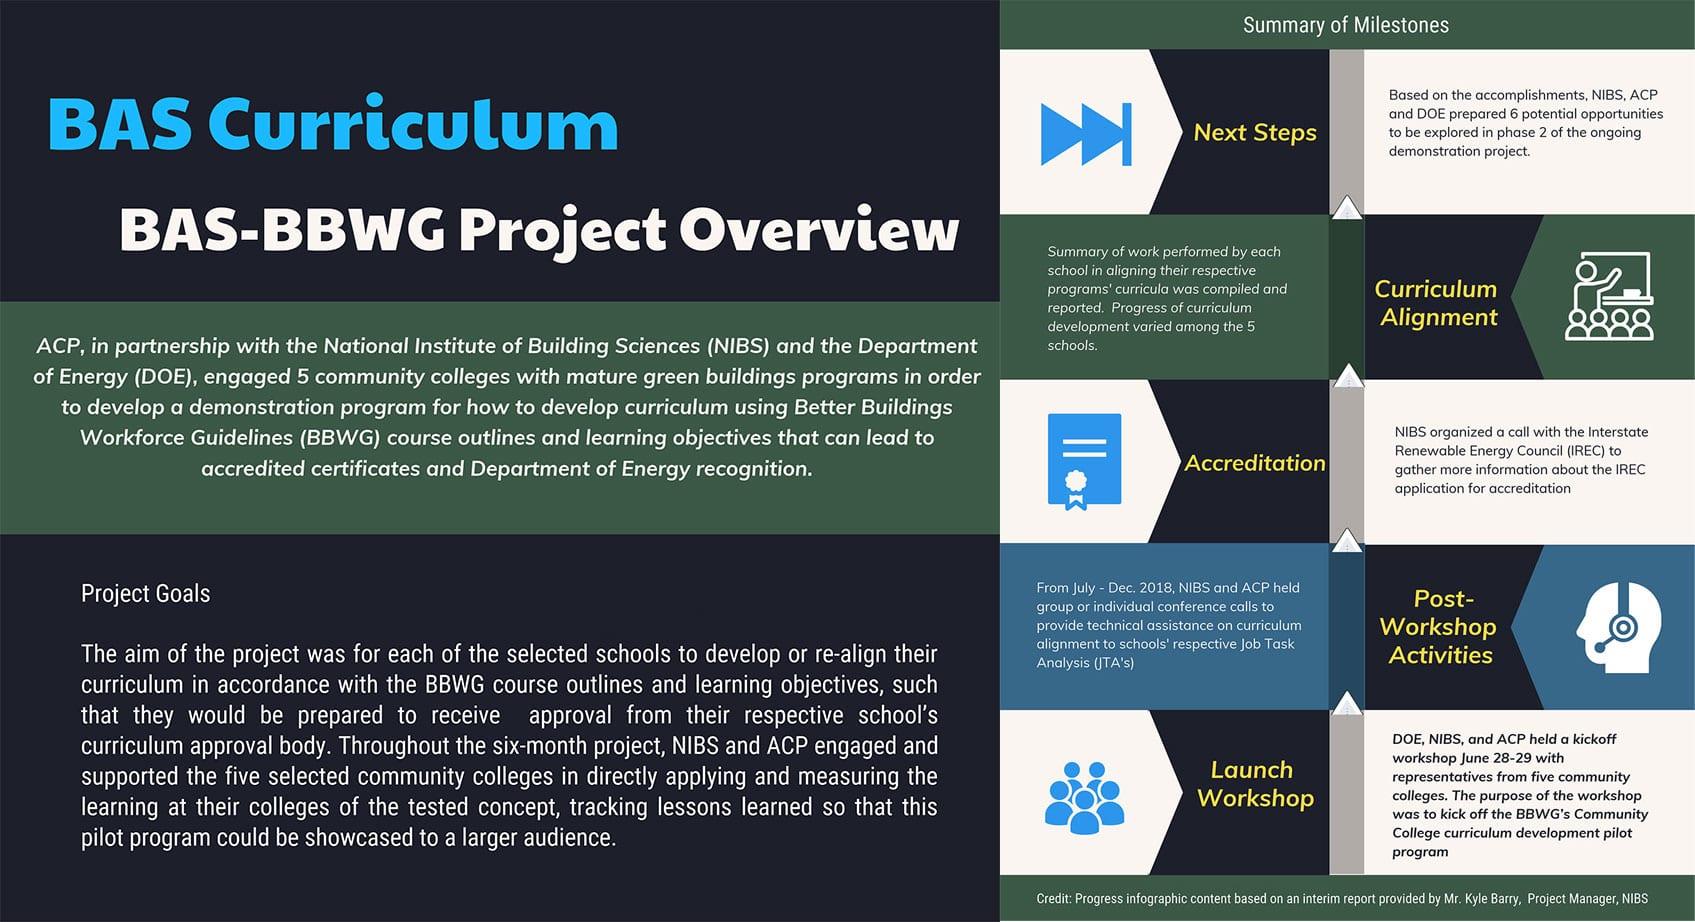 Projects - BAS-BBWG Curriculum